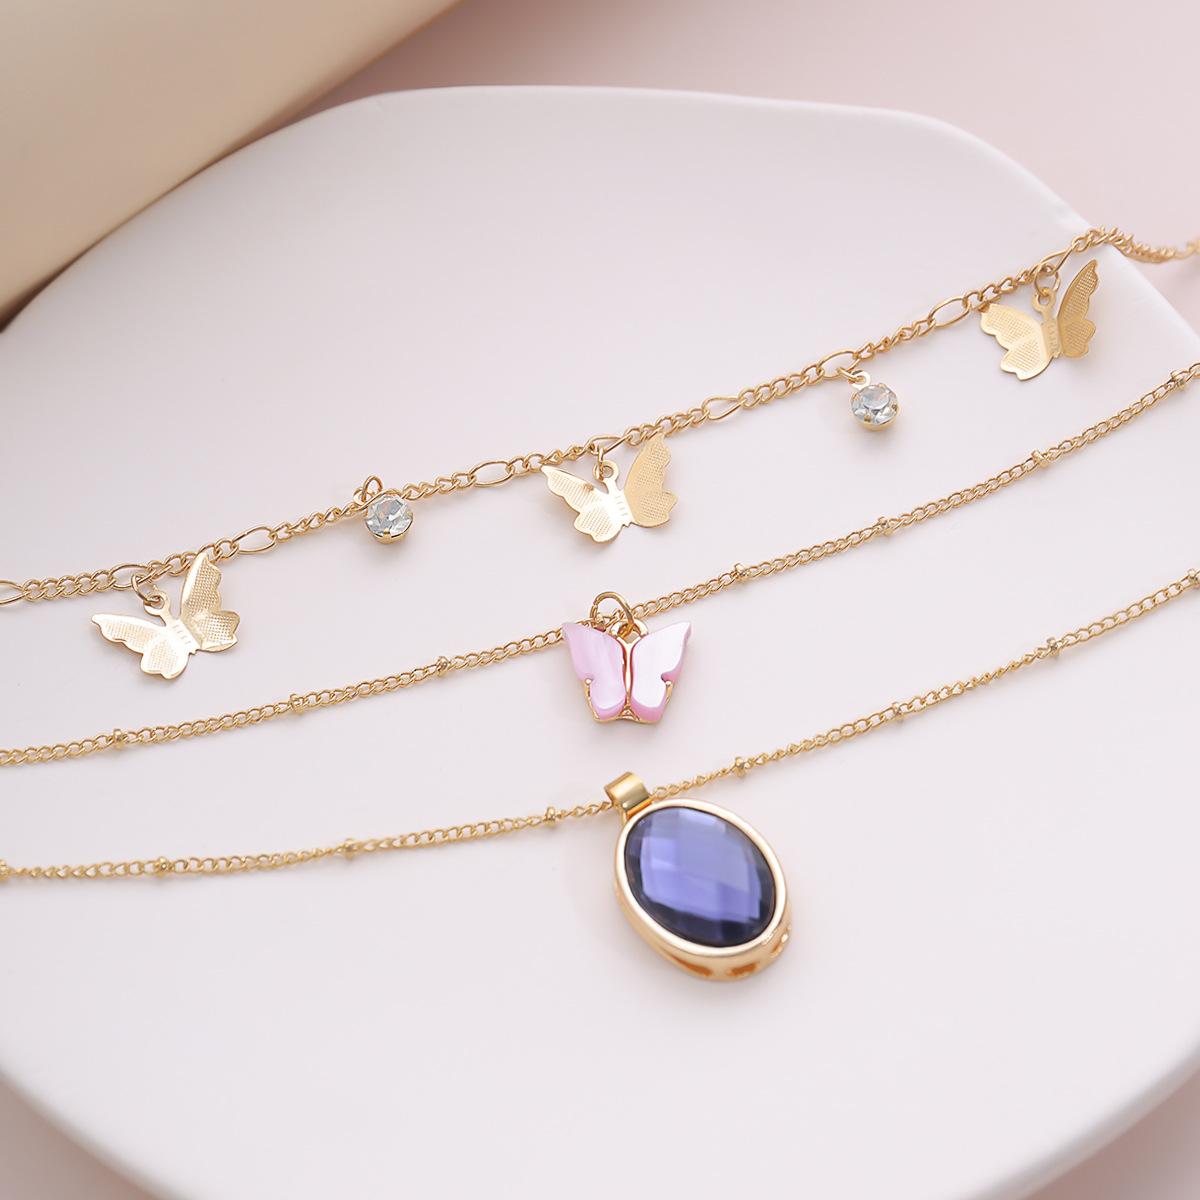 fashion jewelry style oval gemstone jewelry fashion temperament pink small butterfly micro-set necklace wholesale nihaojewelry NHXR225461